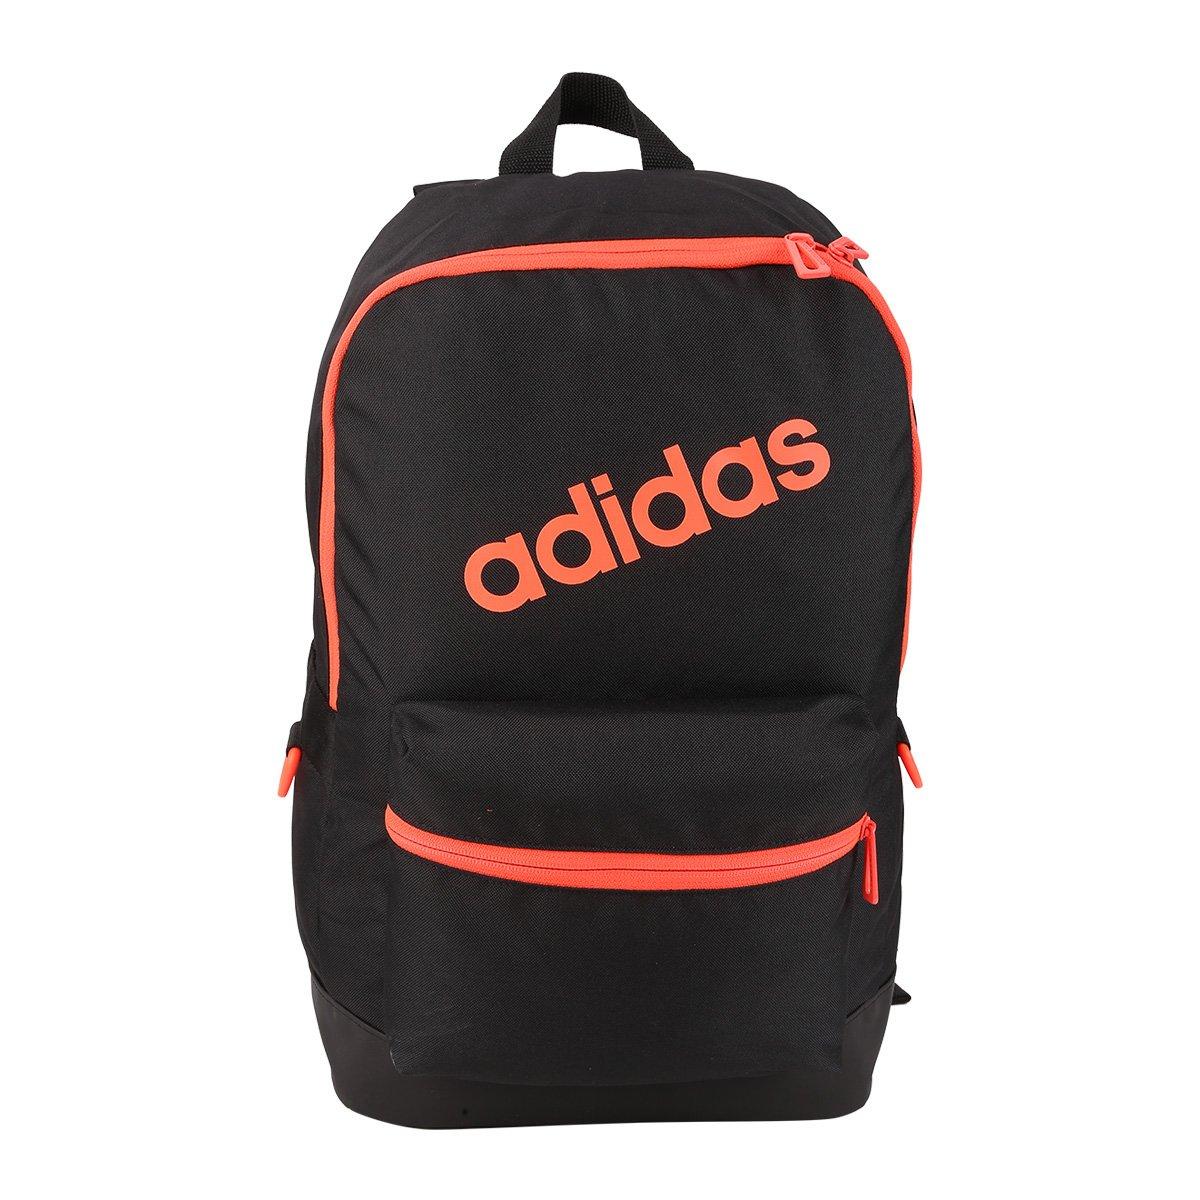 Mochila Adidas Daily Masculina - Compre Agora  77631e7740a3d